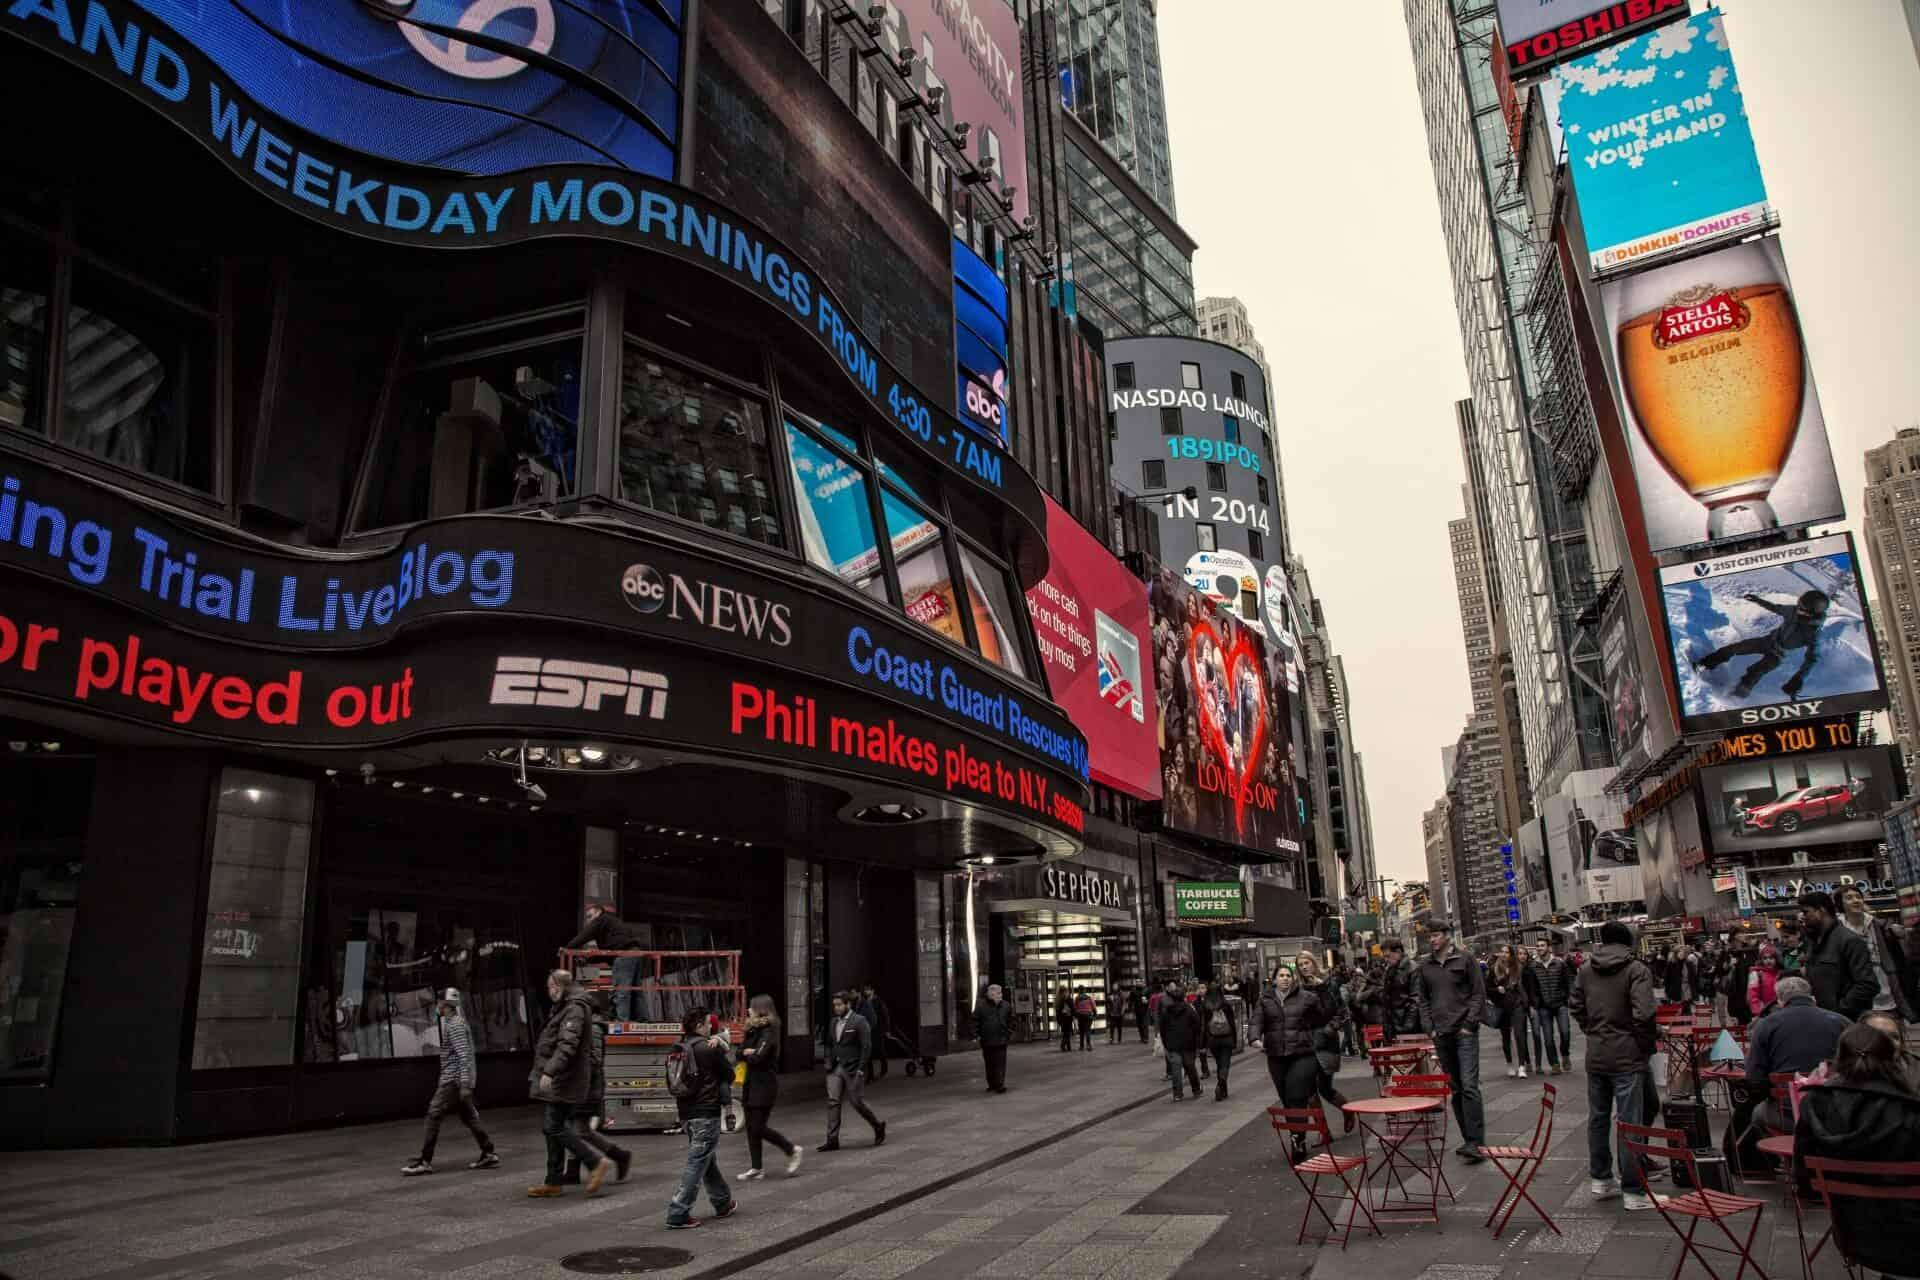 Mennyiért lehet reklámozni a Time Square-en?